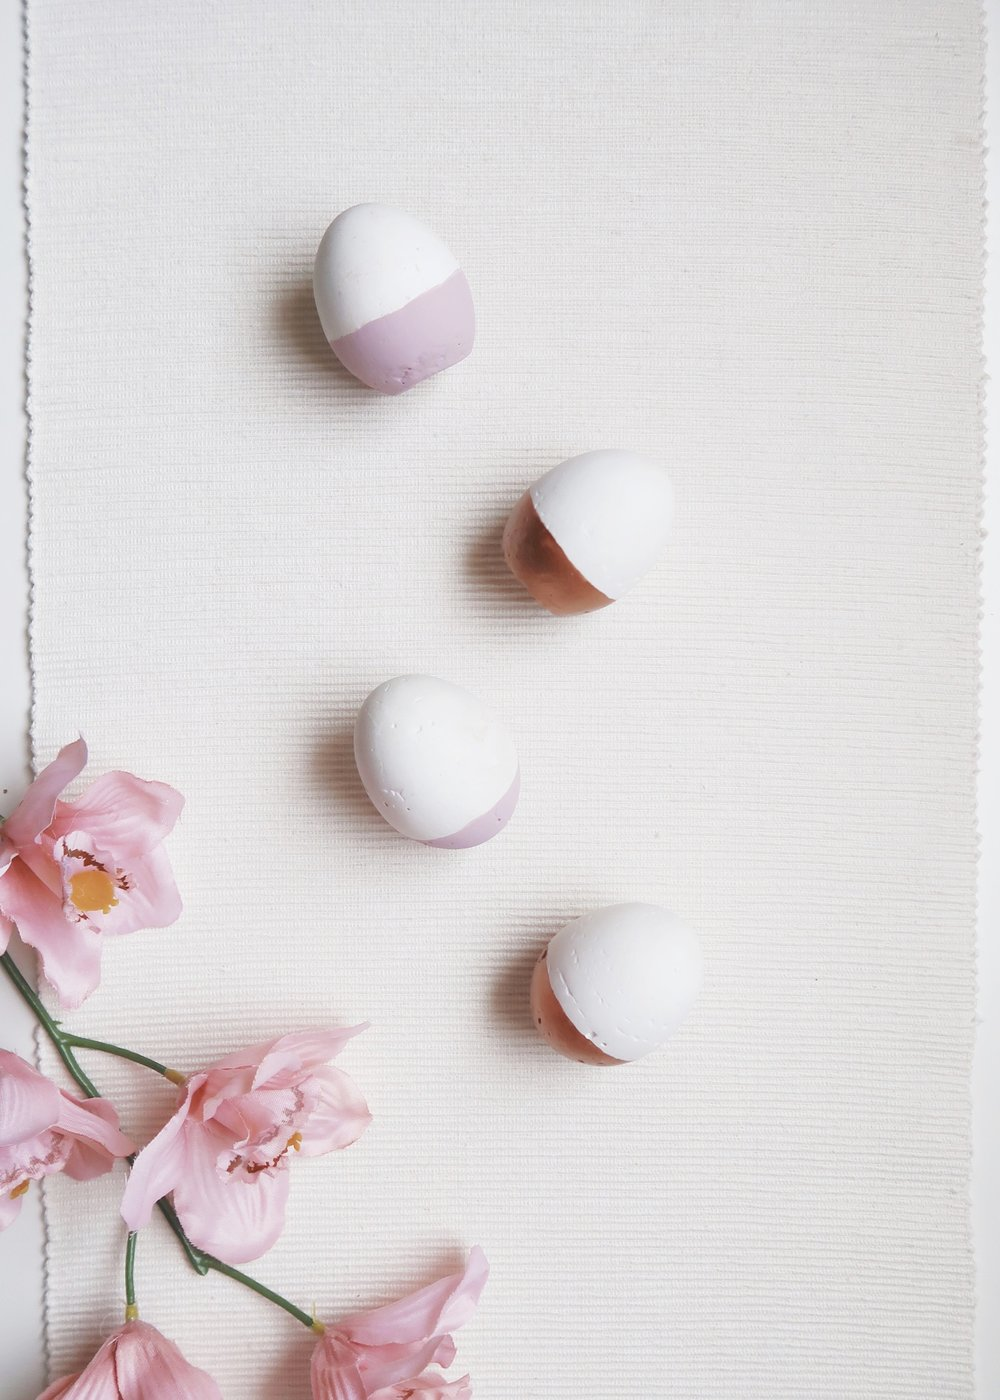 DIY Plaster Easter Egg Decor by Isoscella